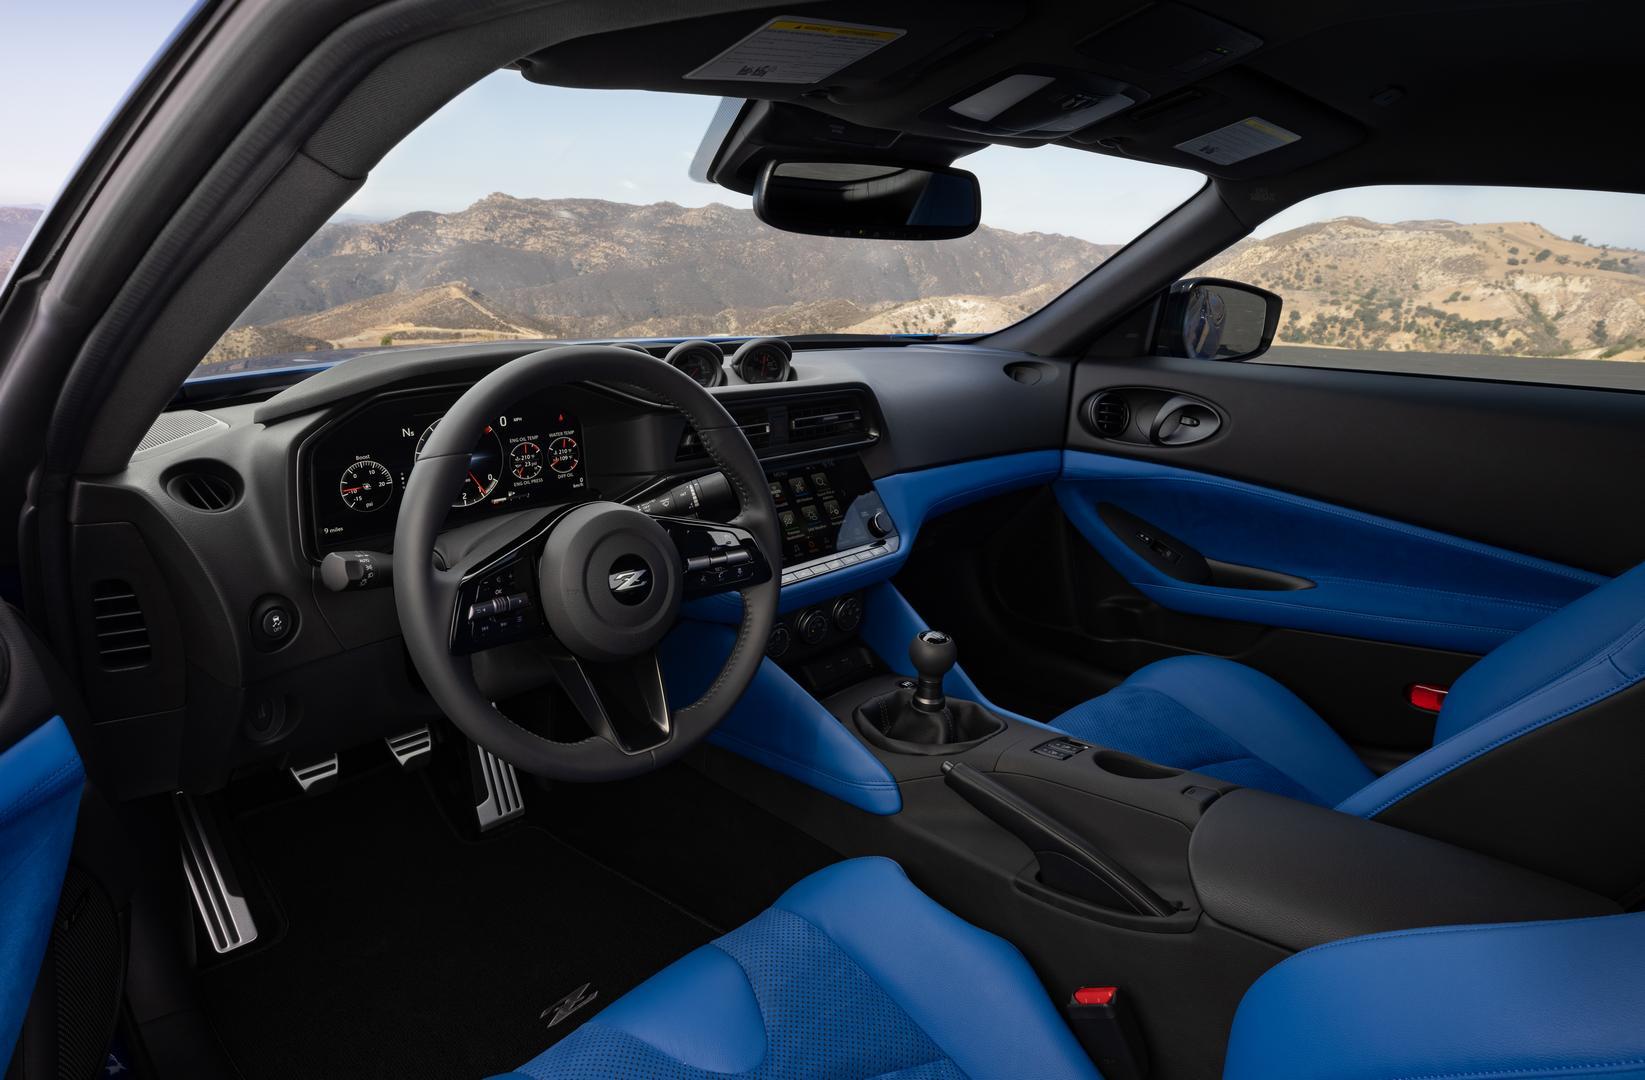 2022 Nissan Z interior blue